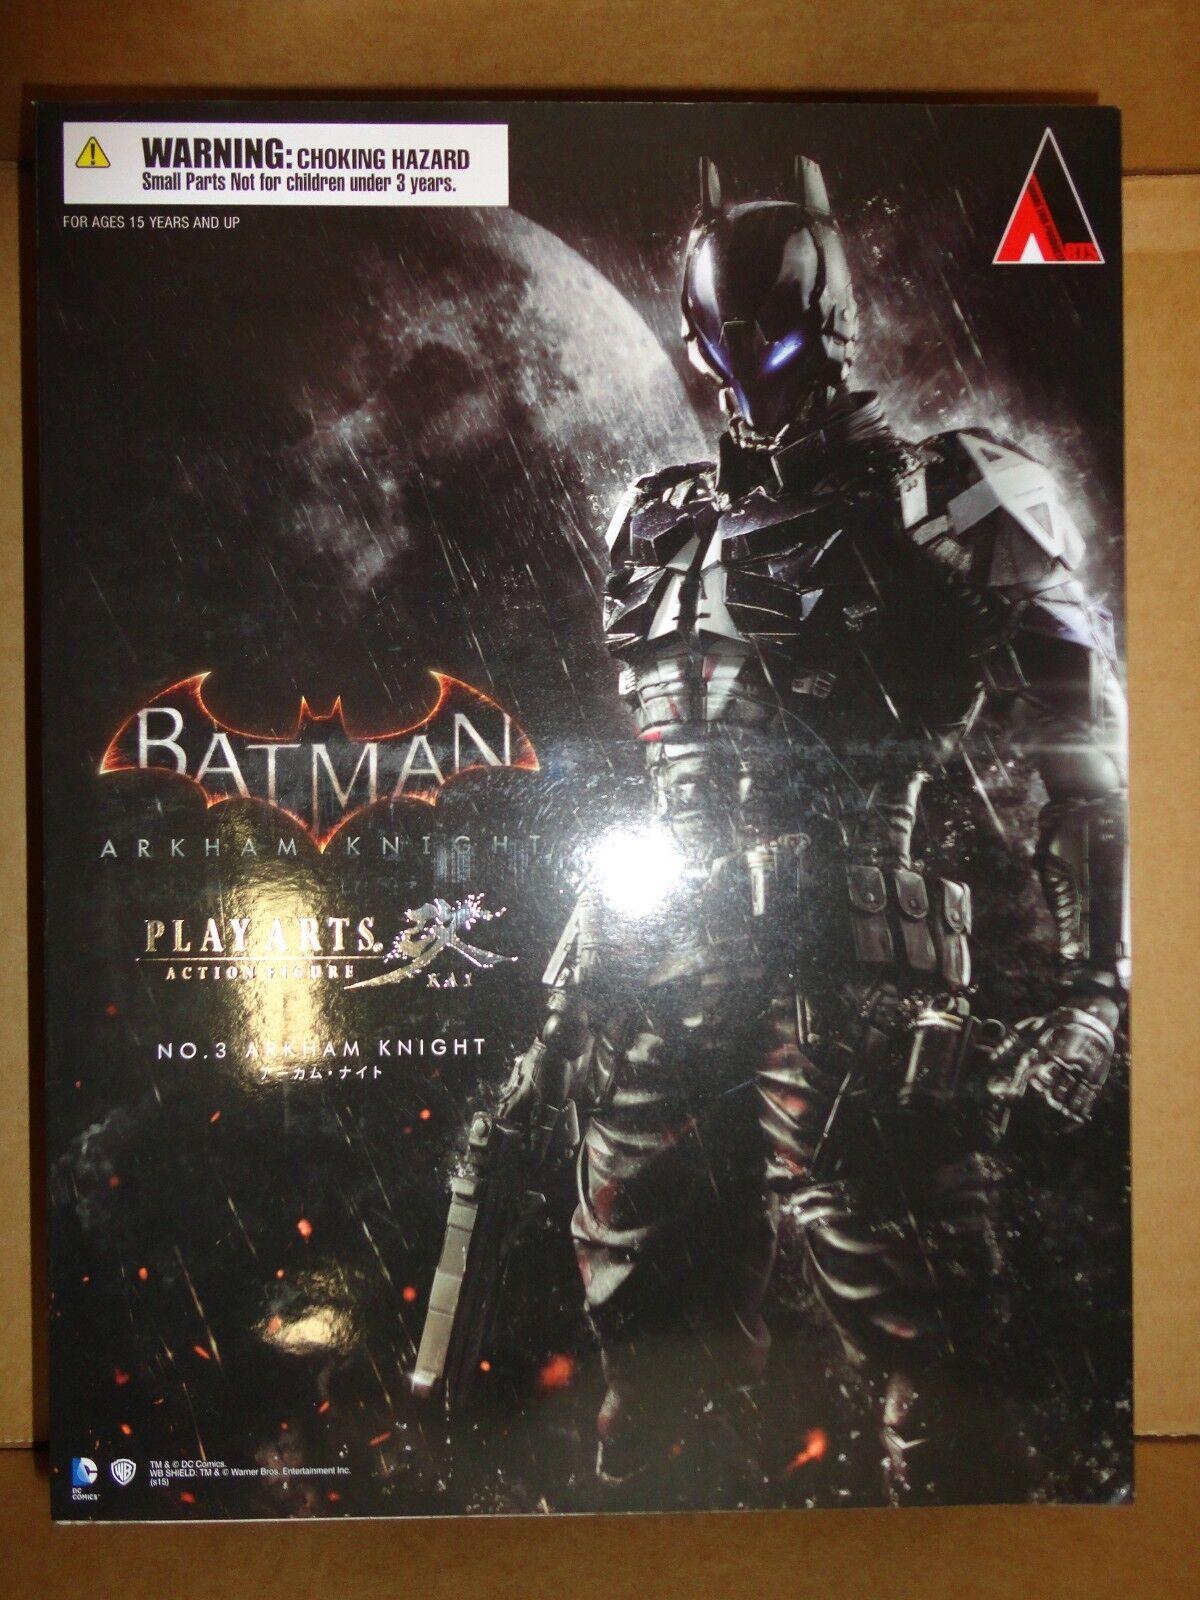 Square Enix Play Arts Kai DC Batuomo Arkham Knight No.3 Pre-owned Very Gd Cond.